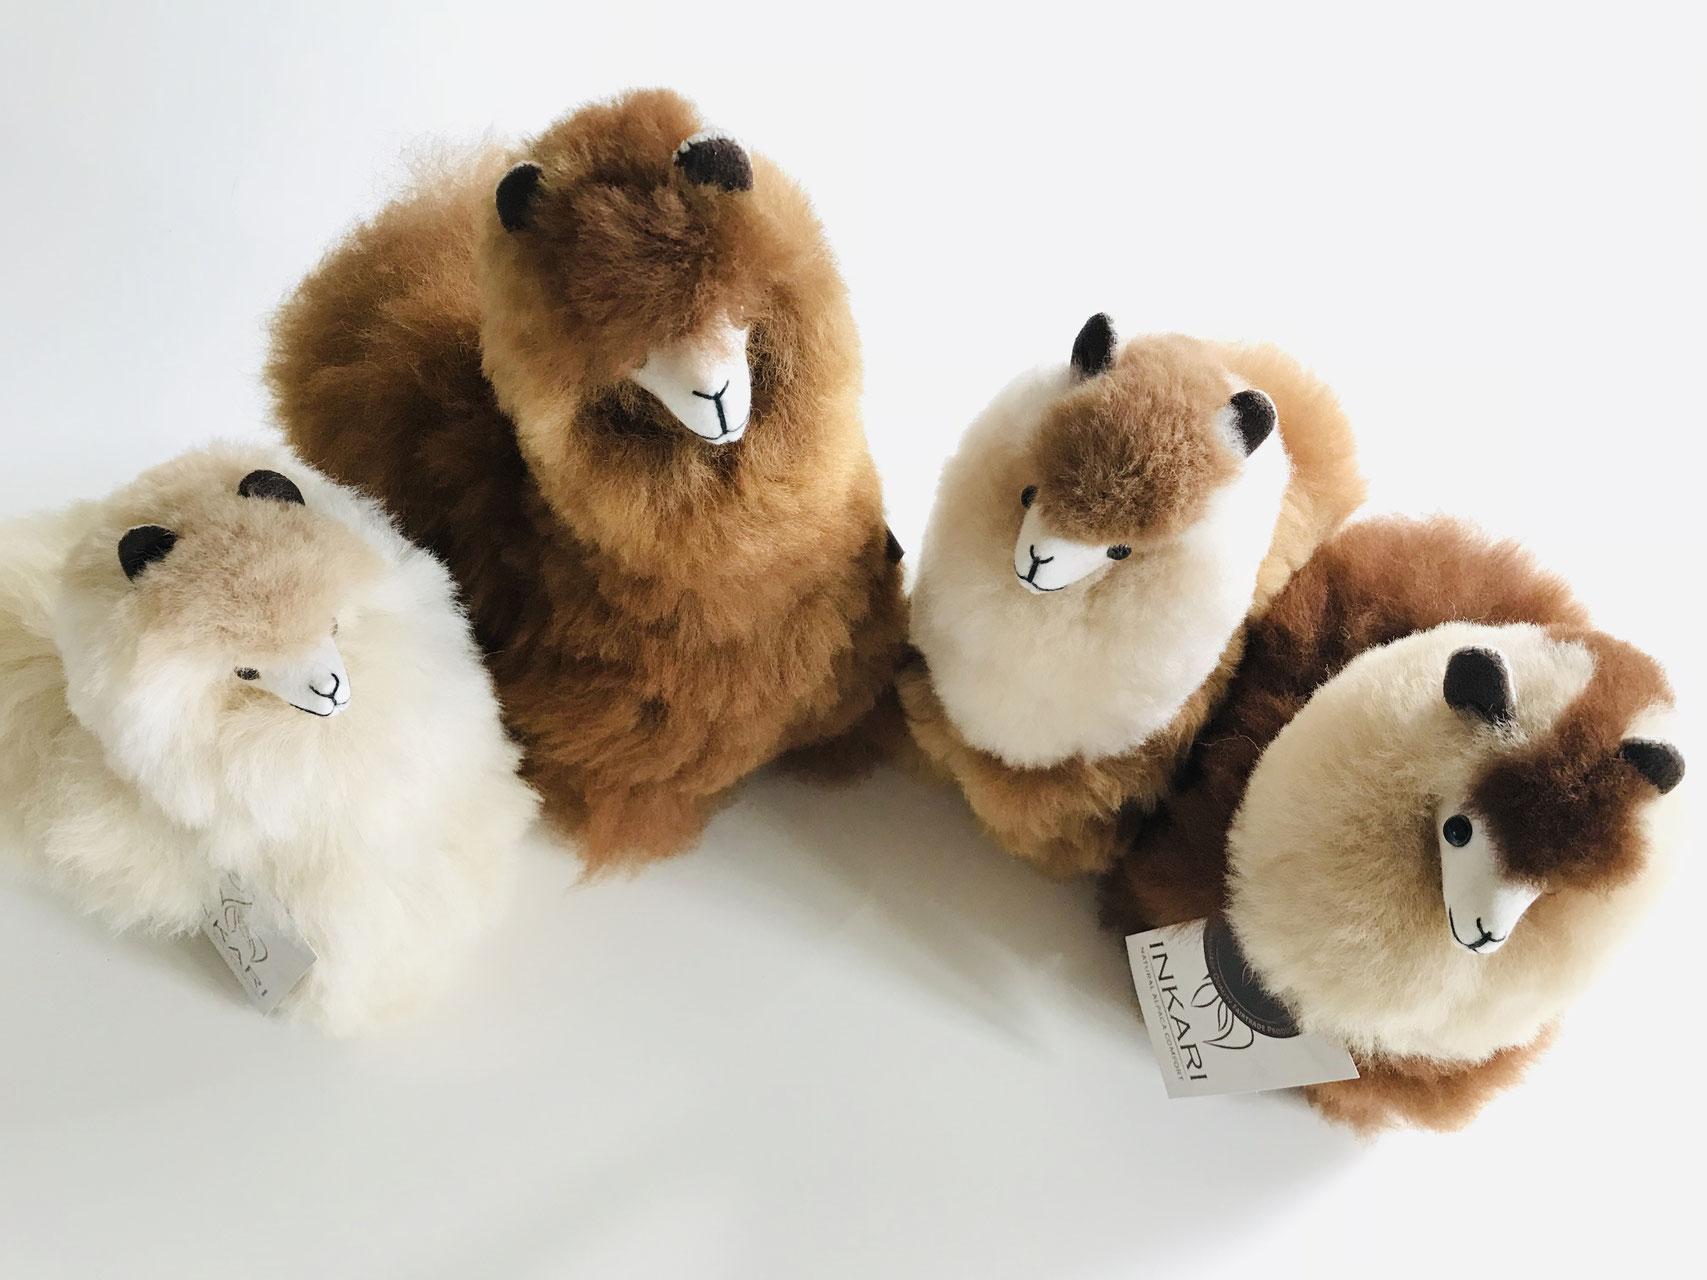 Super Fluffy Fur Llama Stuffed Animal Toy in 3 Sizes Eco-Friendly Alpaca Plushie Inkari Alpaca Soft Toy Sahara Handmade Cute Plush Alpaca Toy of Natural Alpaca Wool S